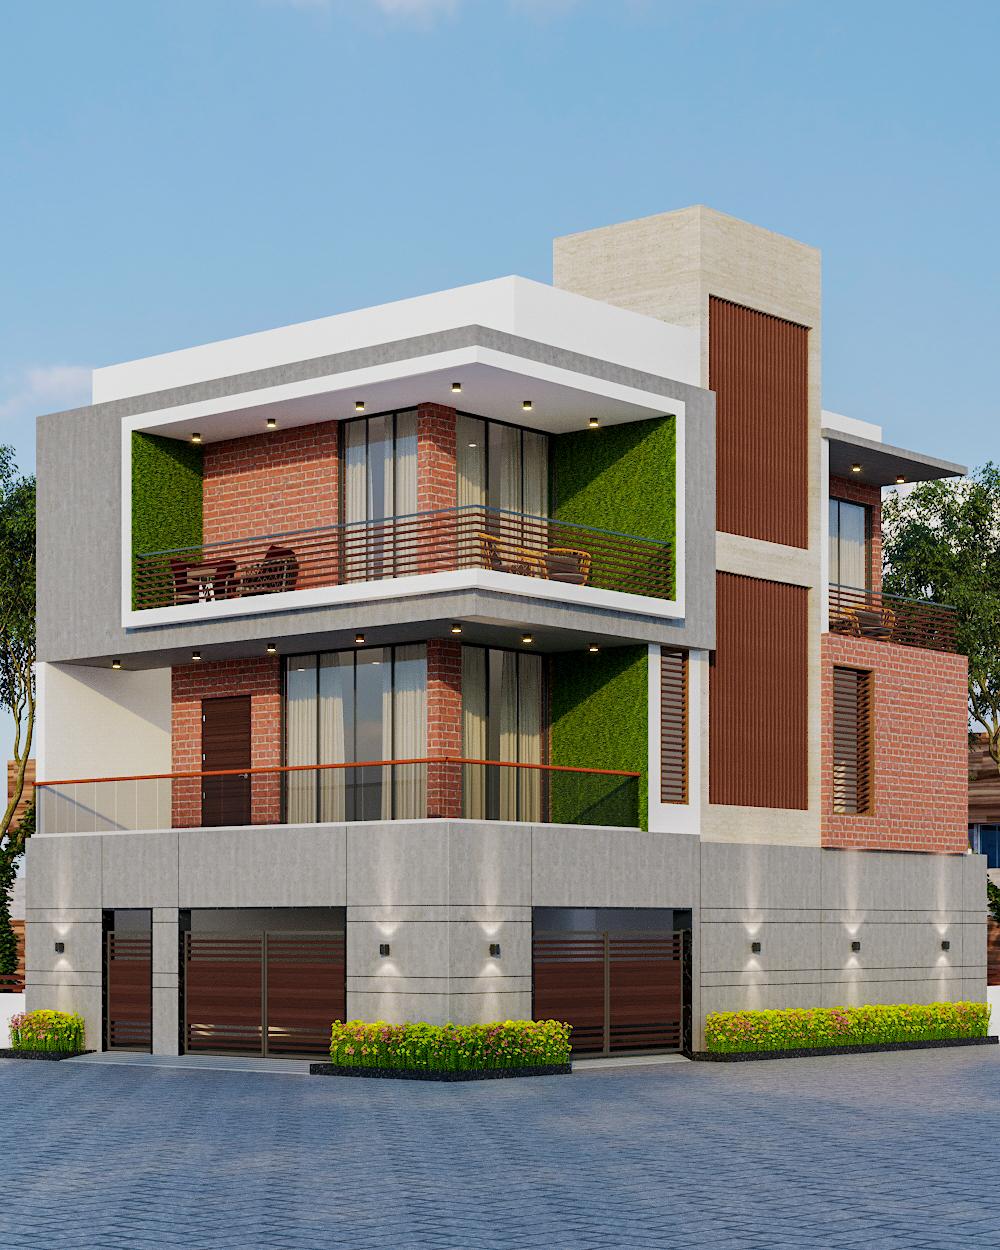 Ranchodbhai's Residence